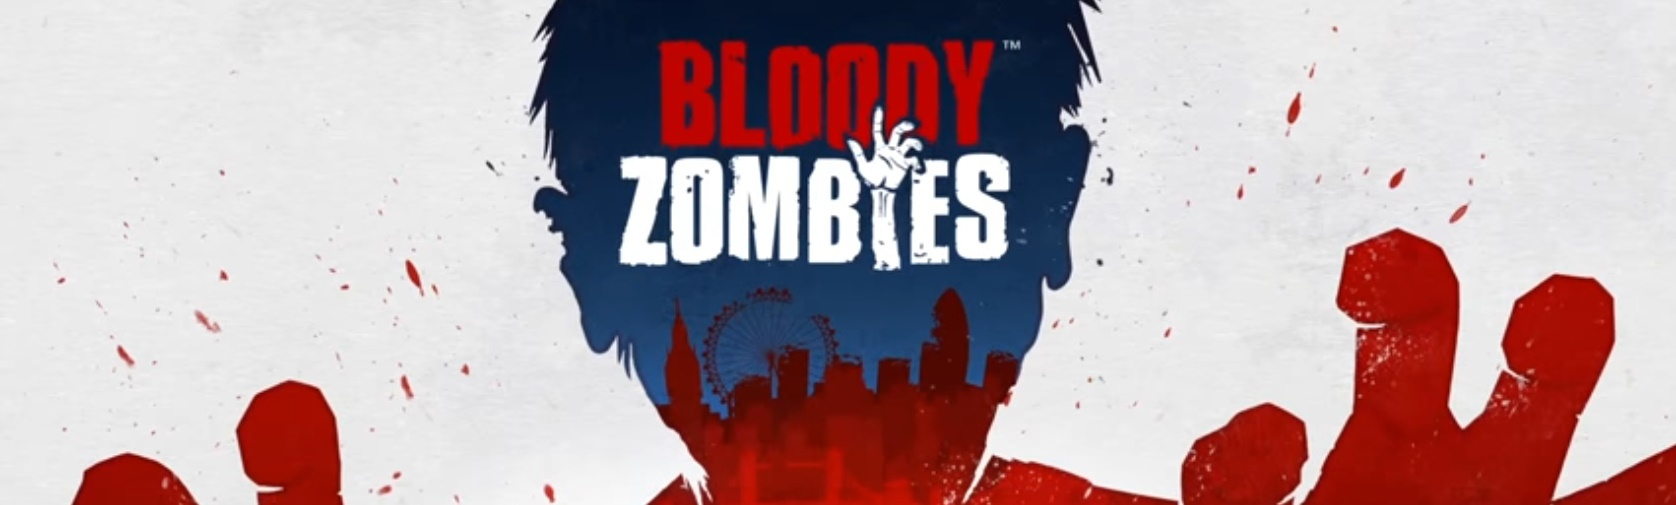 bloody-zombies7tjpq.jpg